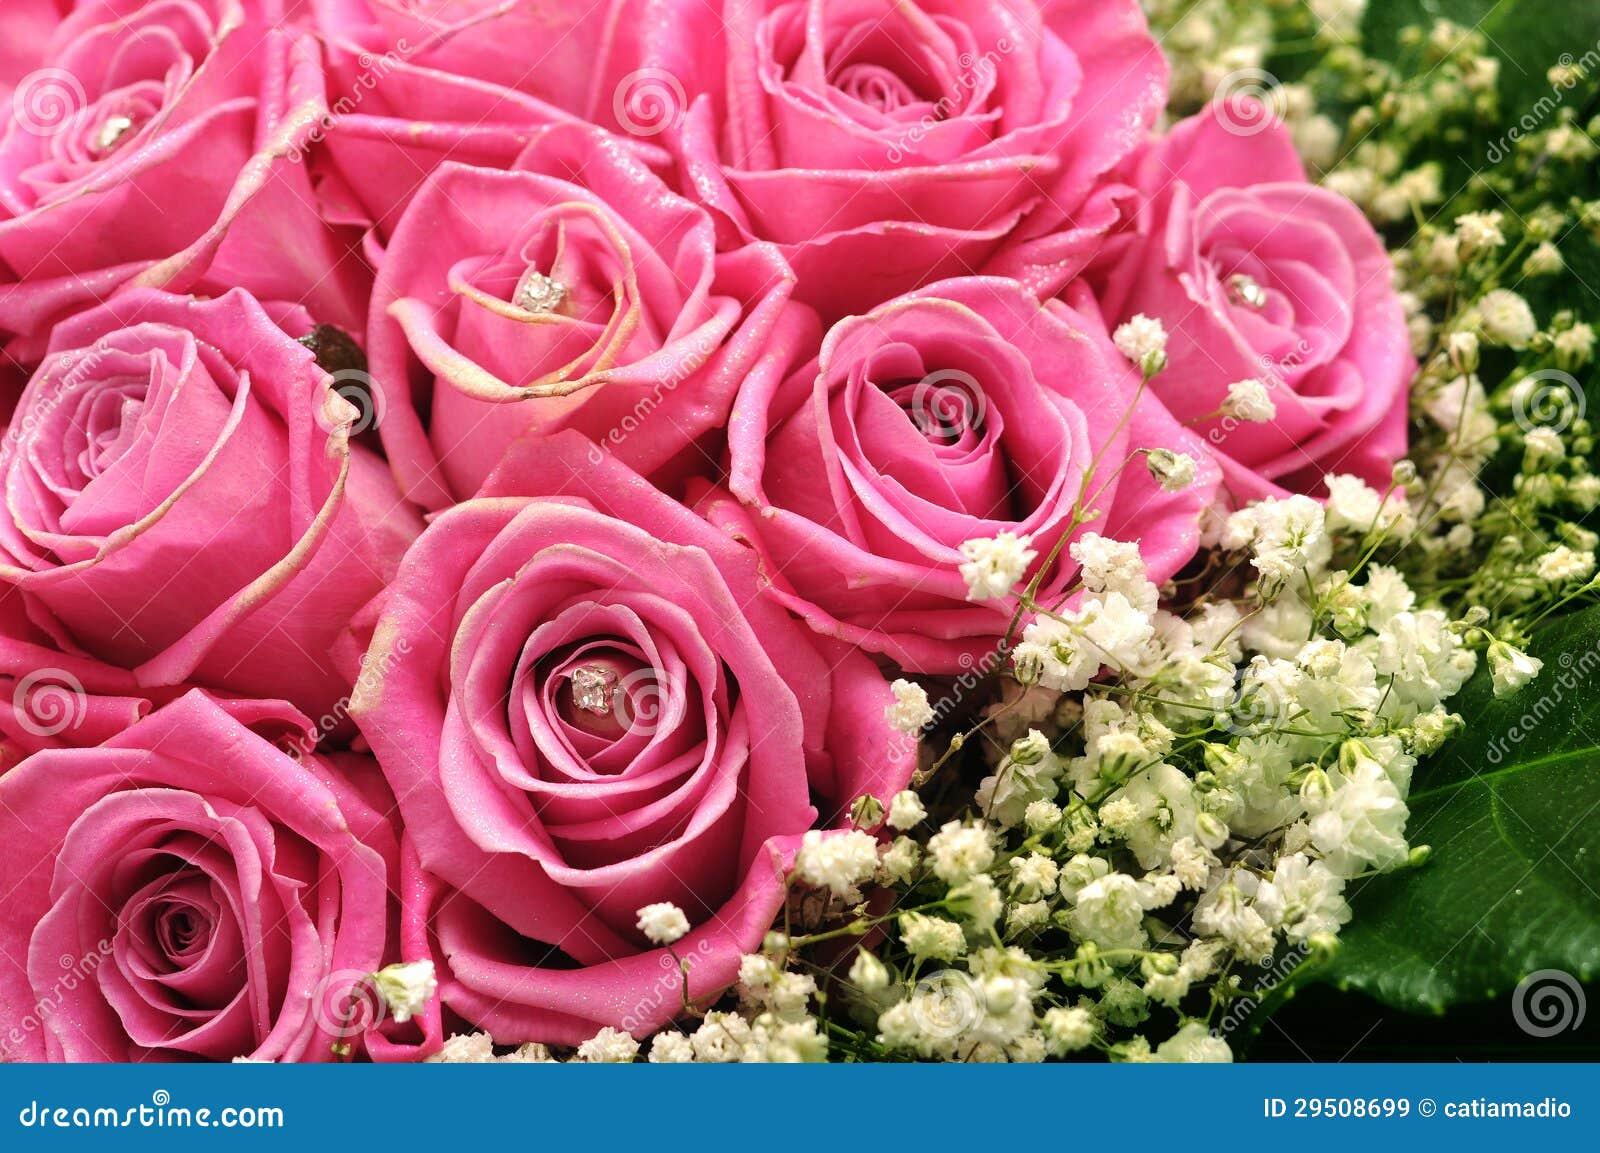 Rosa Rosen mit Funkeln